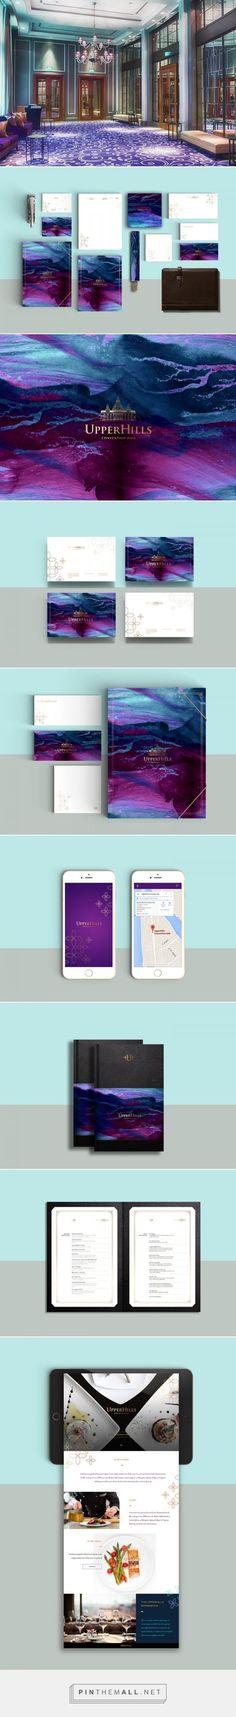 Upperhills Convention Hall Branding by Nero Graphic Atelier | Fivestar Branding – Design and Branding Agency & Inspiration Gallery